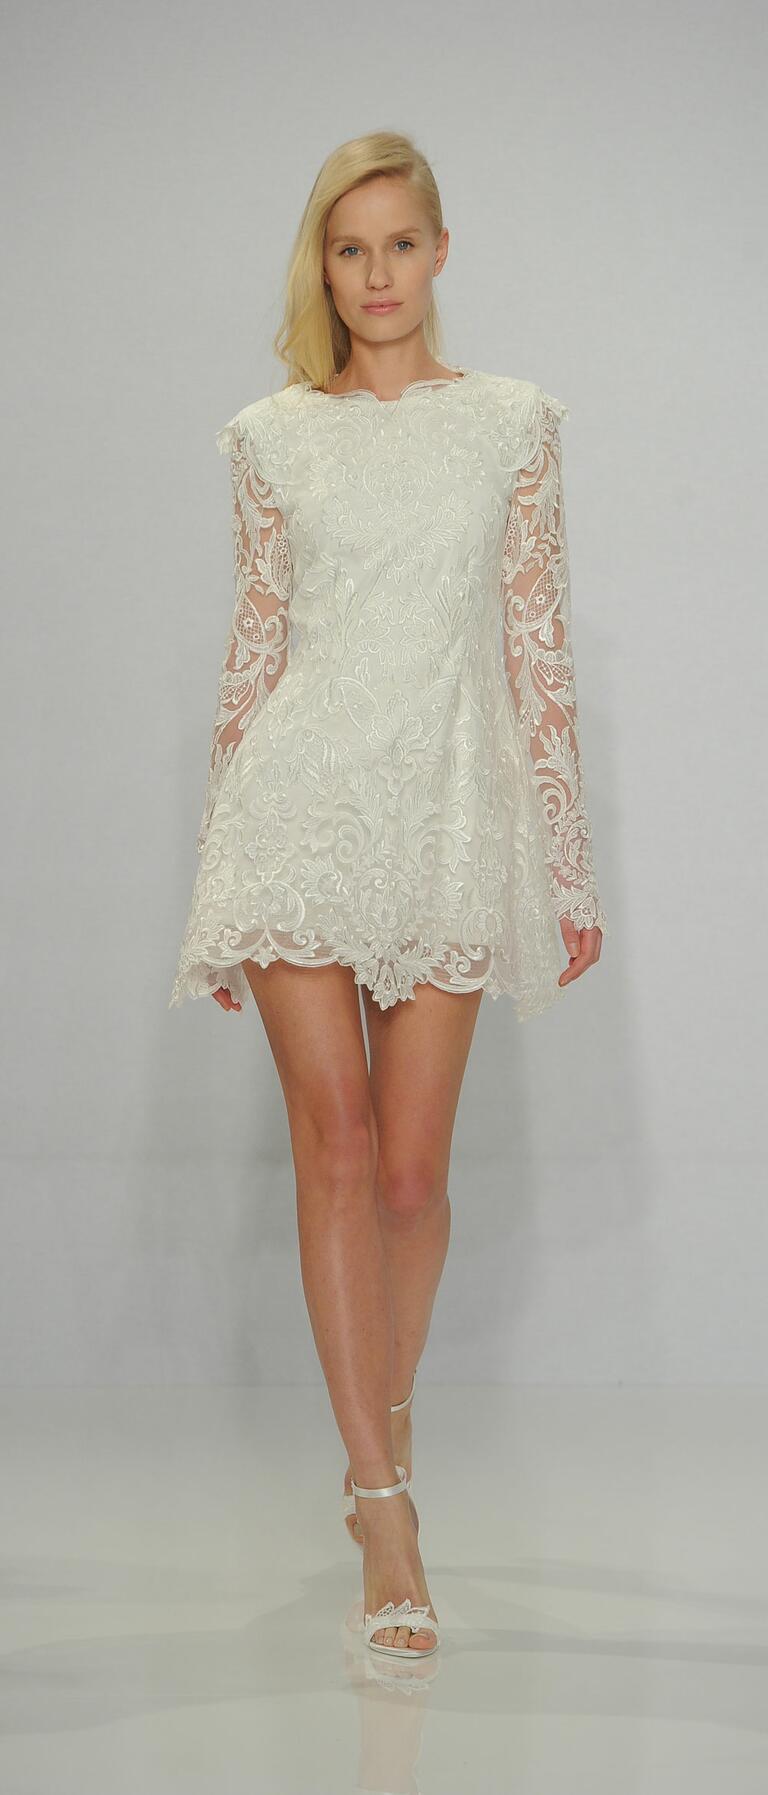 Christian Siriano Spring 2017 long sleeve lace mini wedding dress